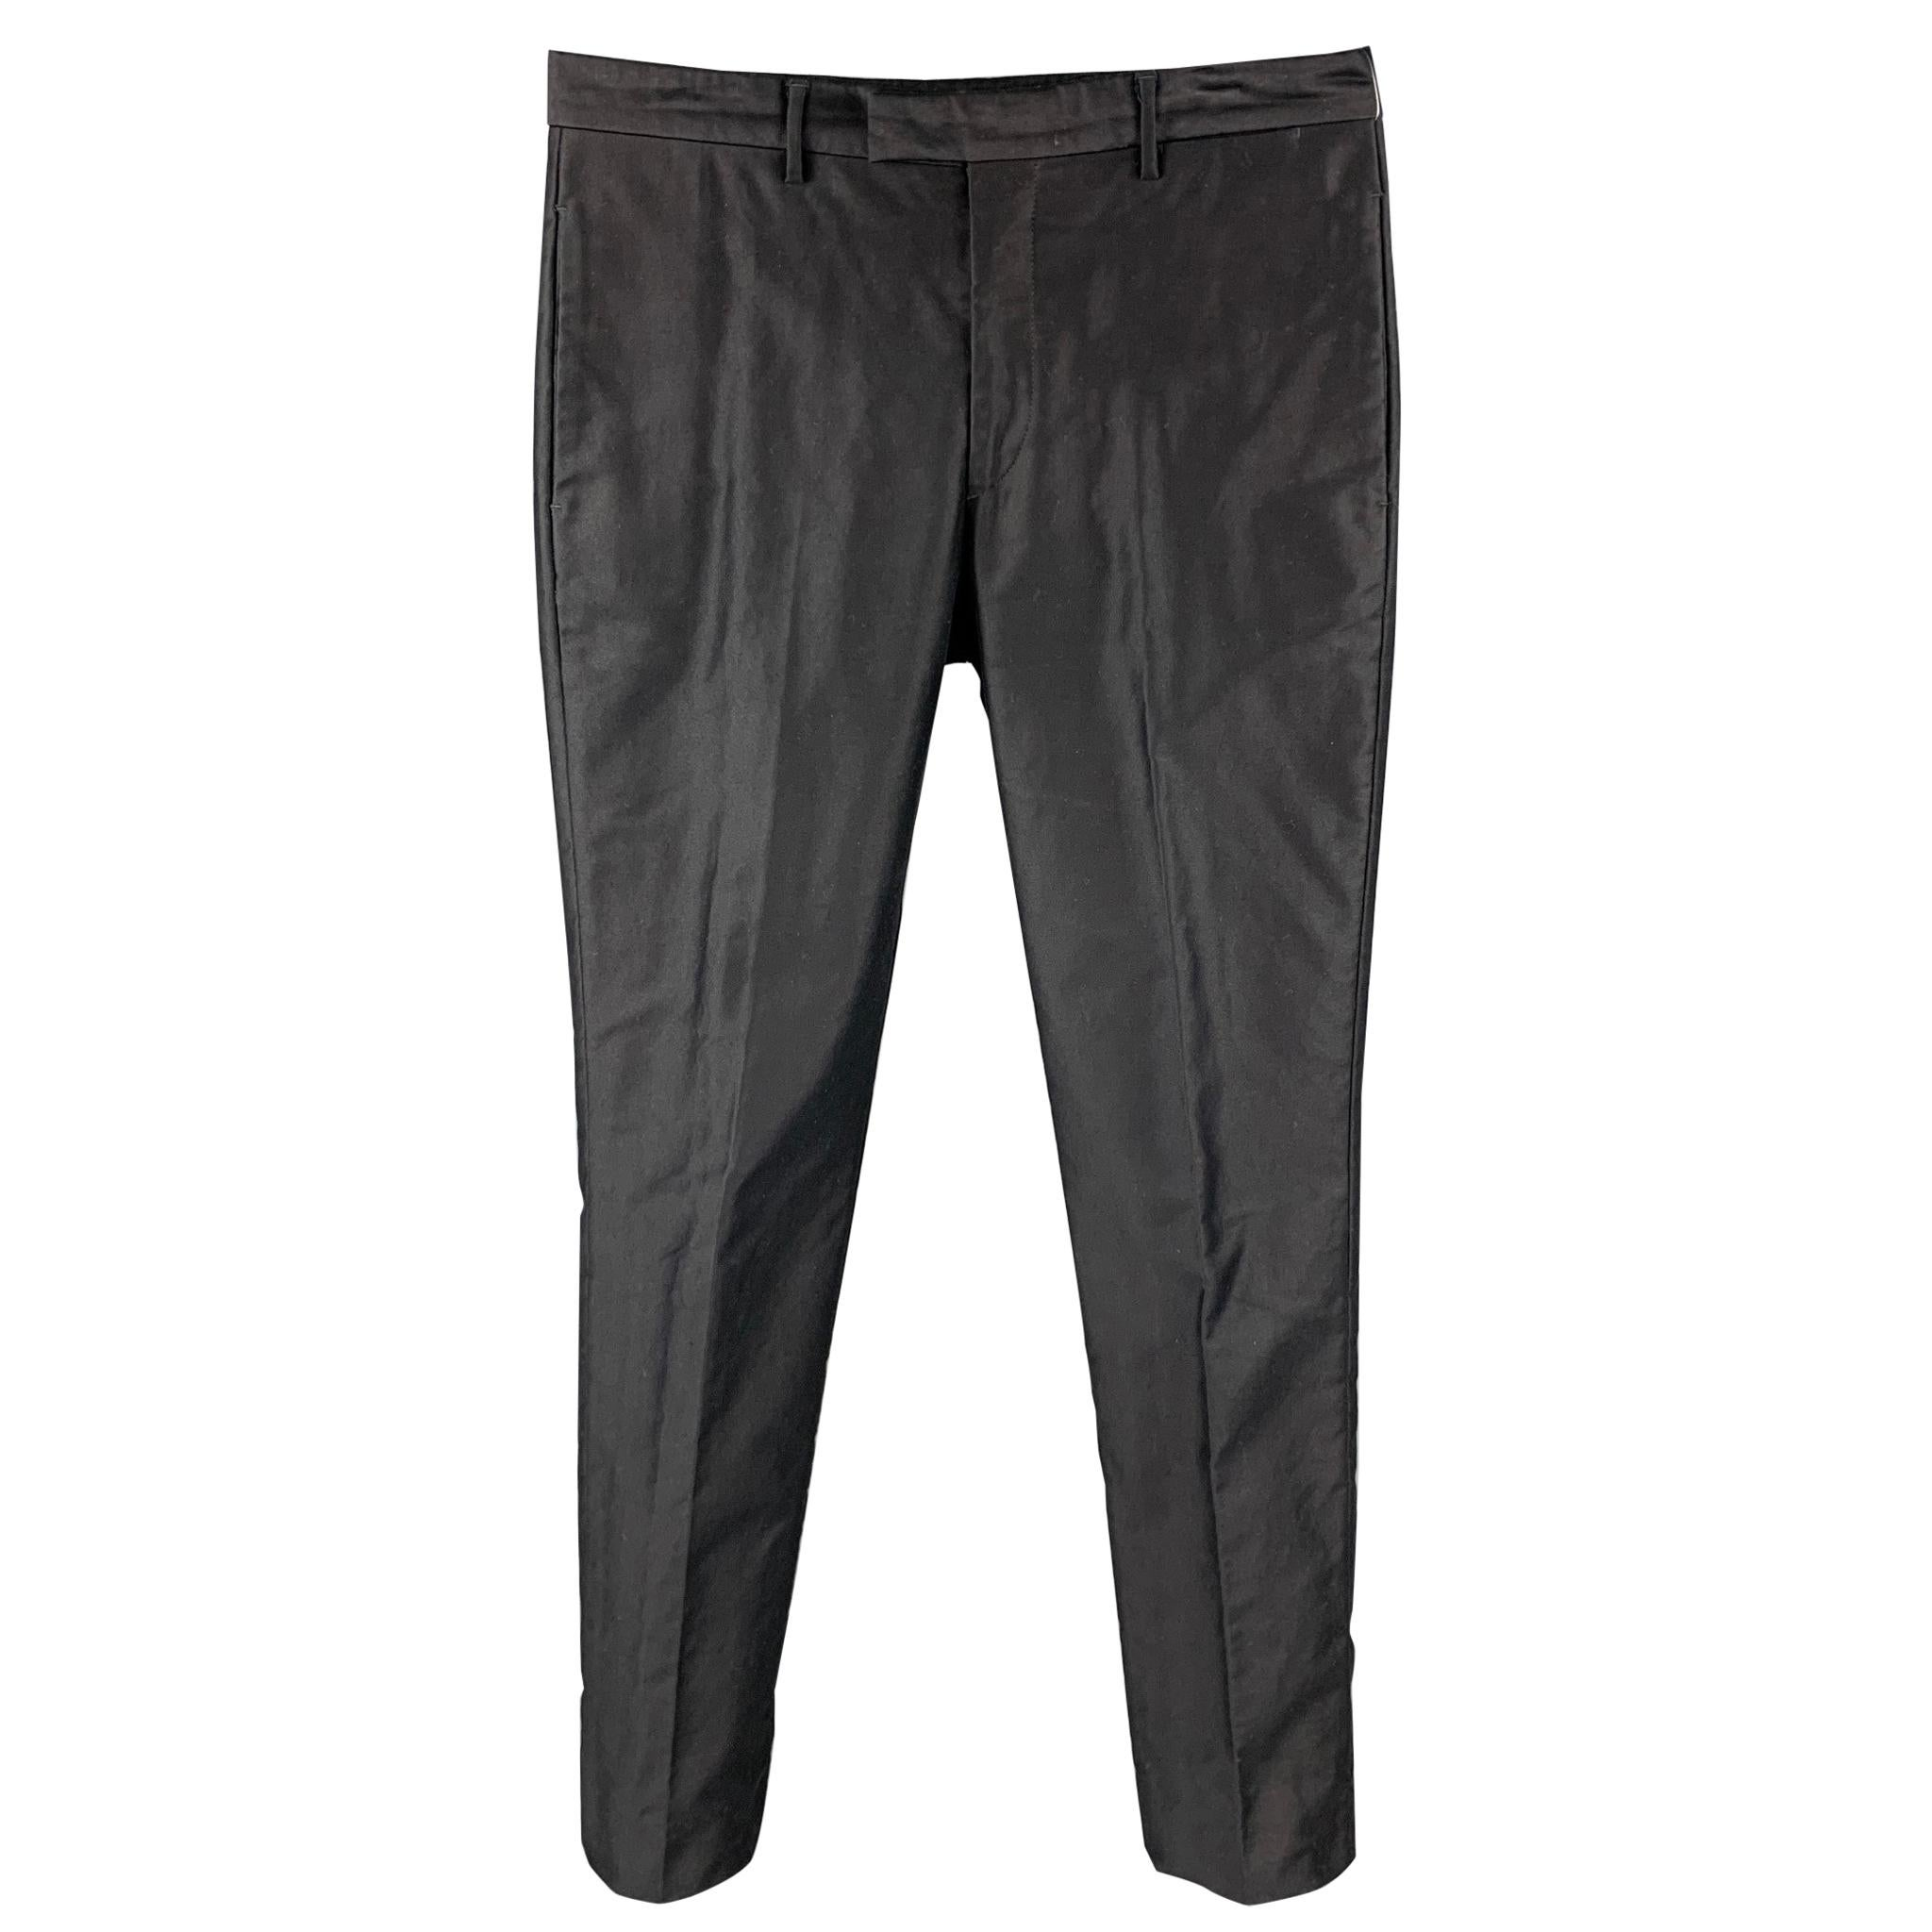 PRADA Size 32 Navy Cotton Zip Fly Dress Pants